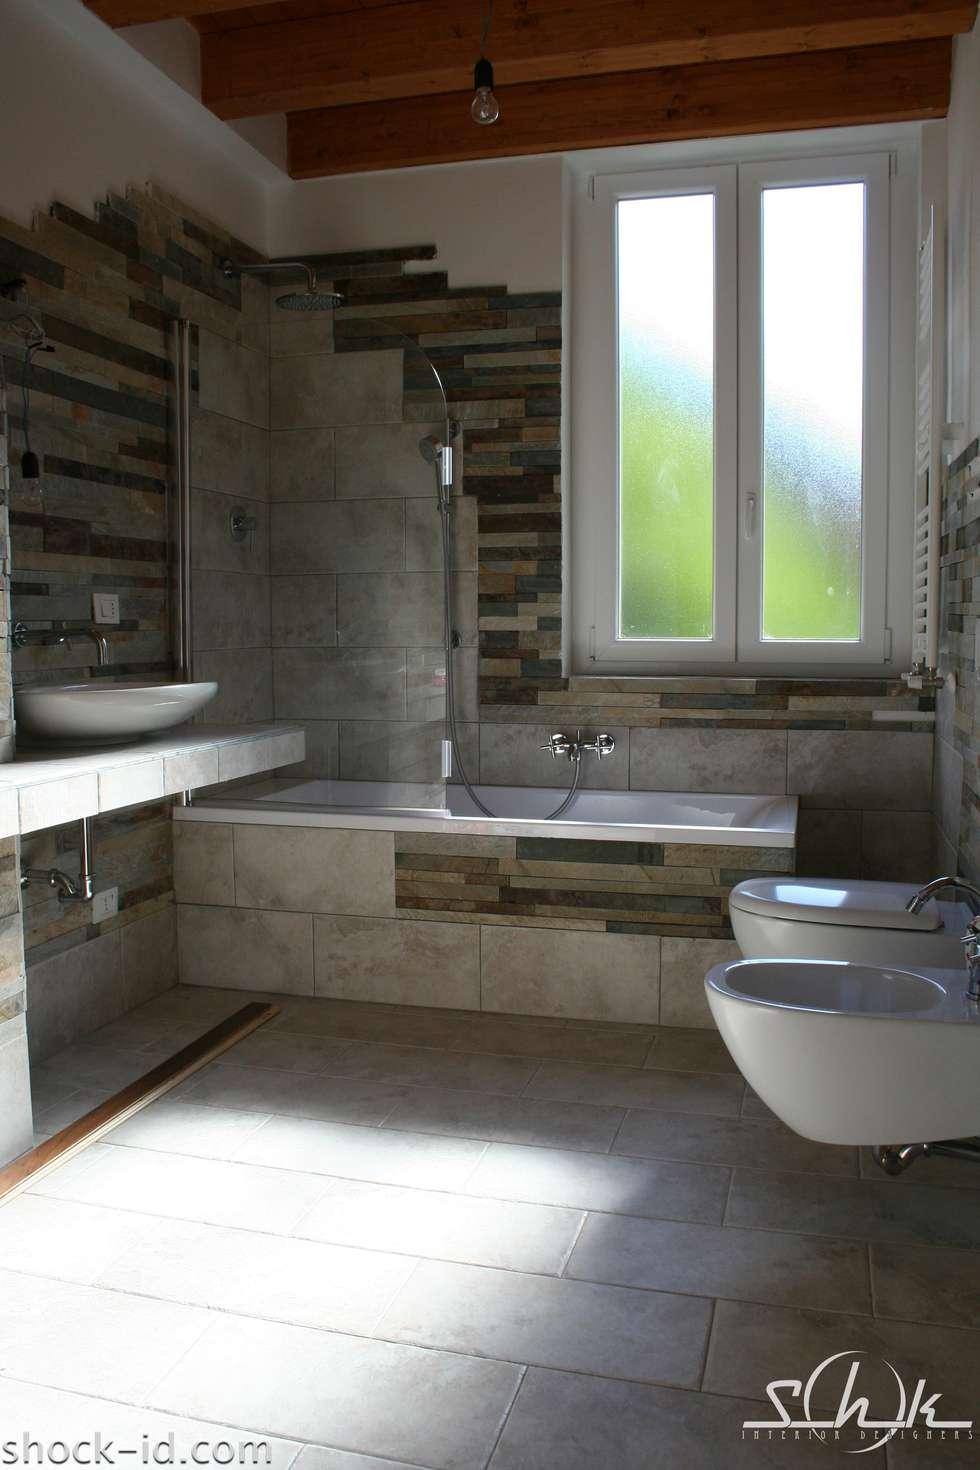 Idee arredamento casa interior design homify - Arredo bagno rustico foto ...